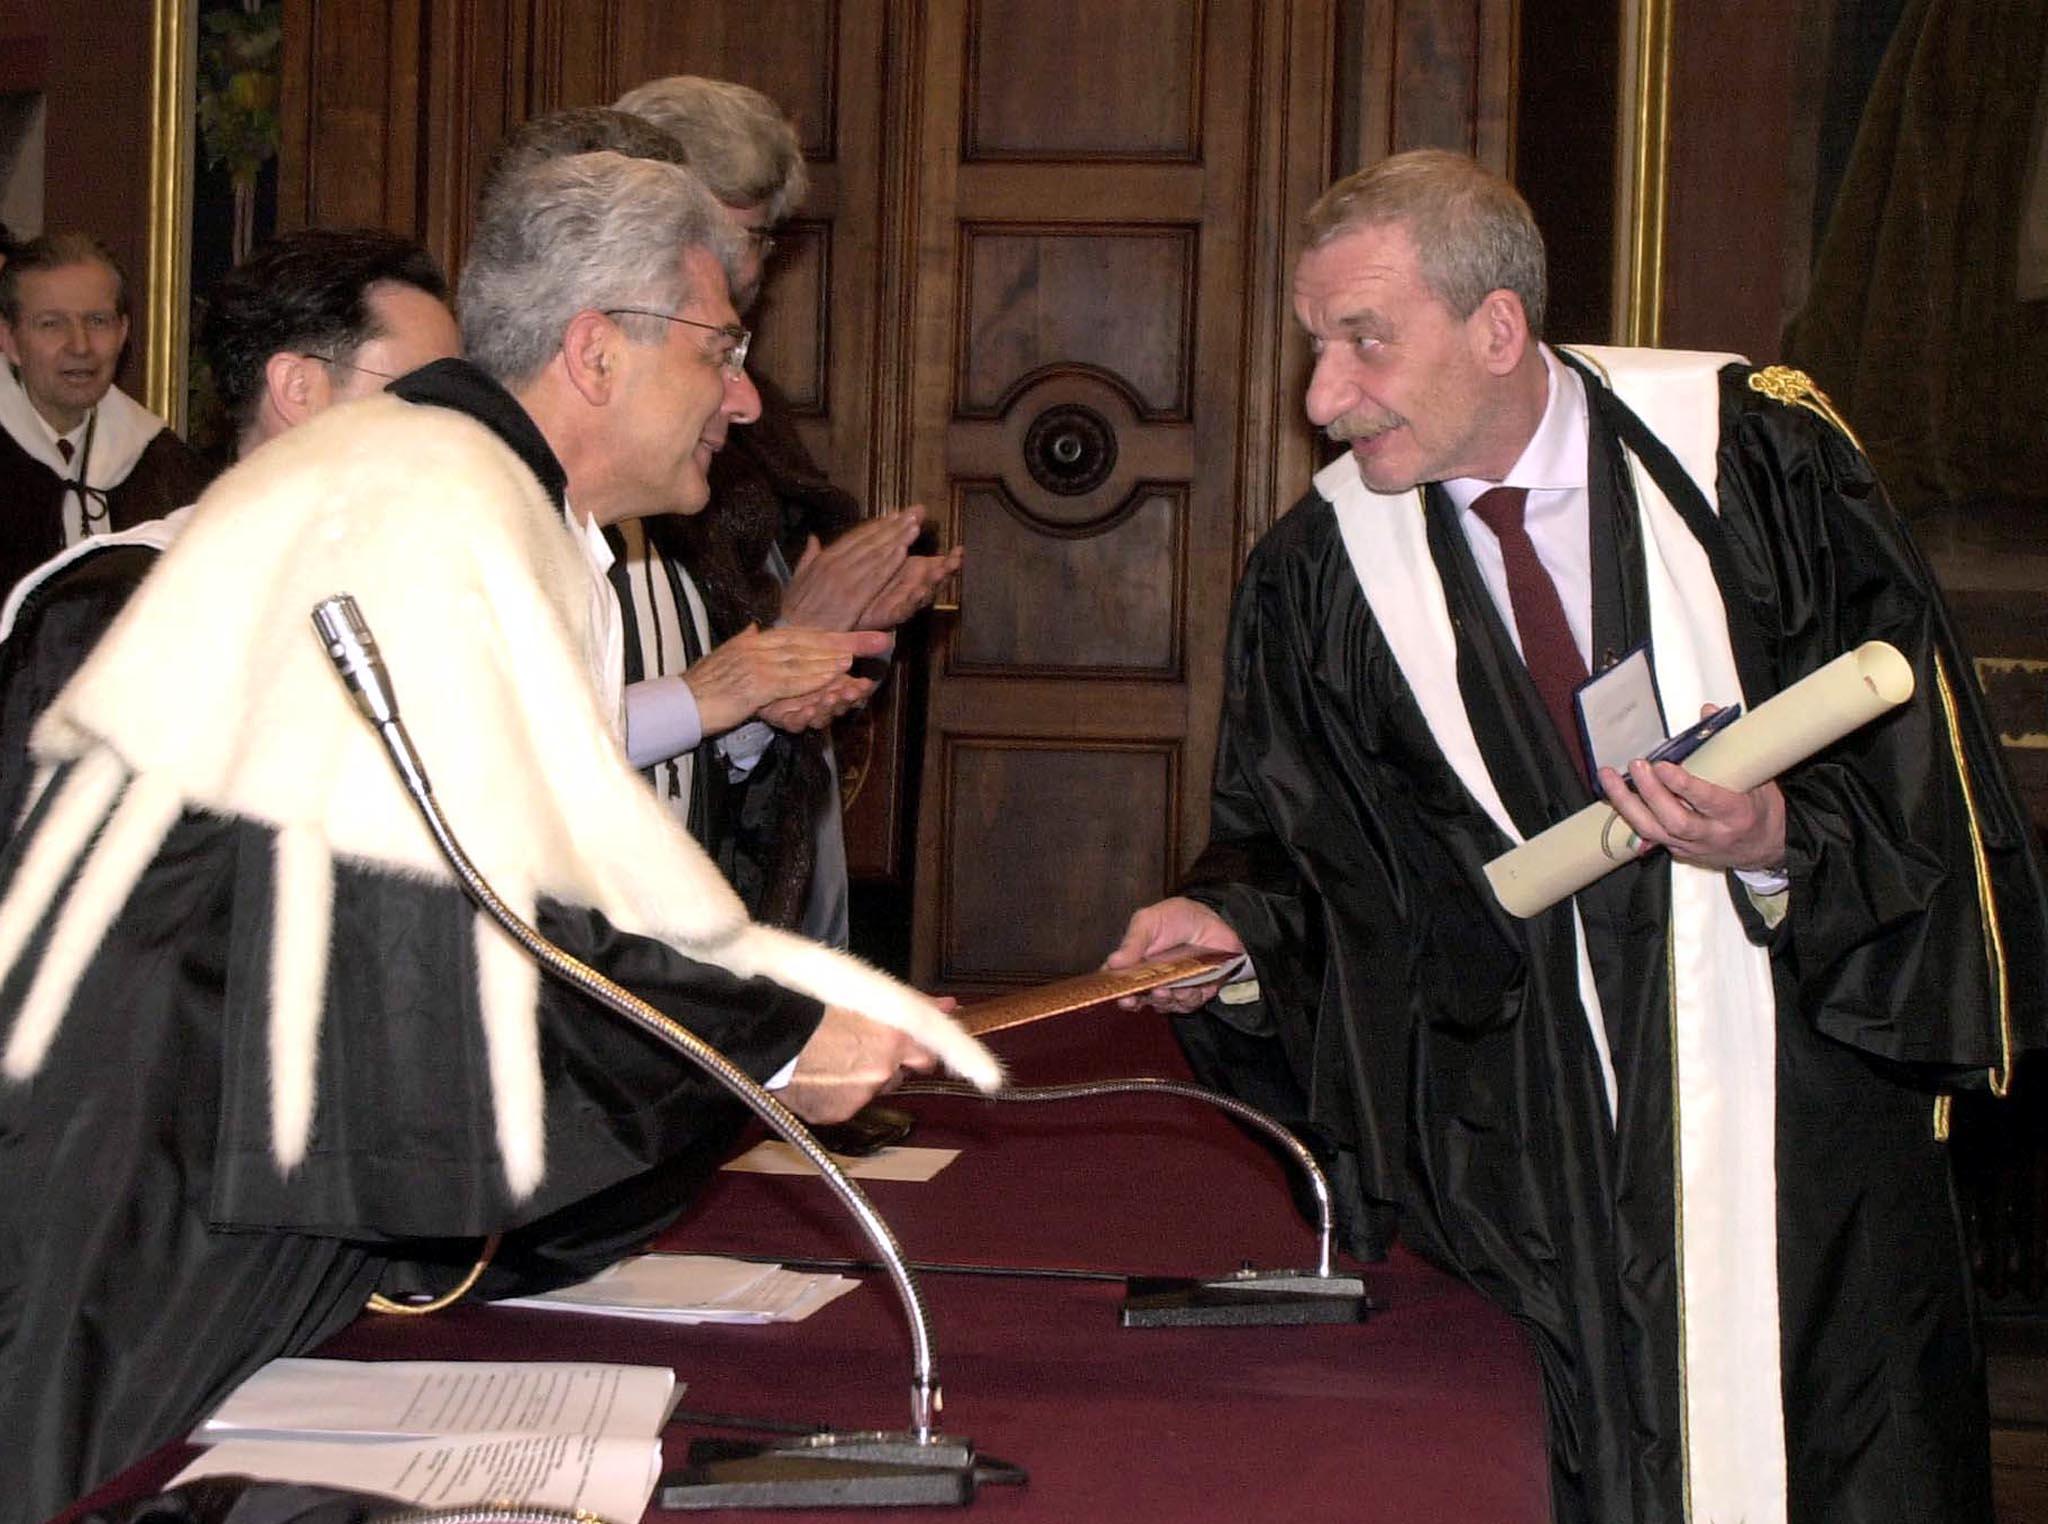 Paolo Conte laurea honoris causa 06f508eab3c1